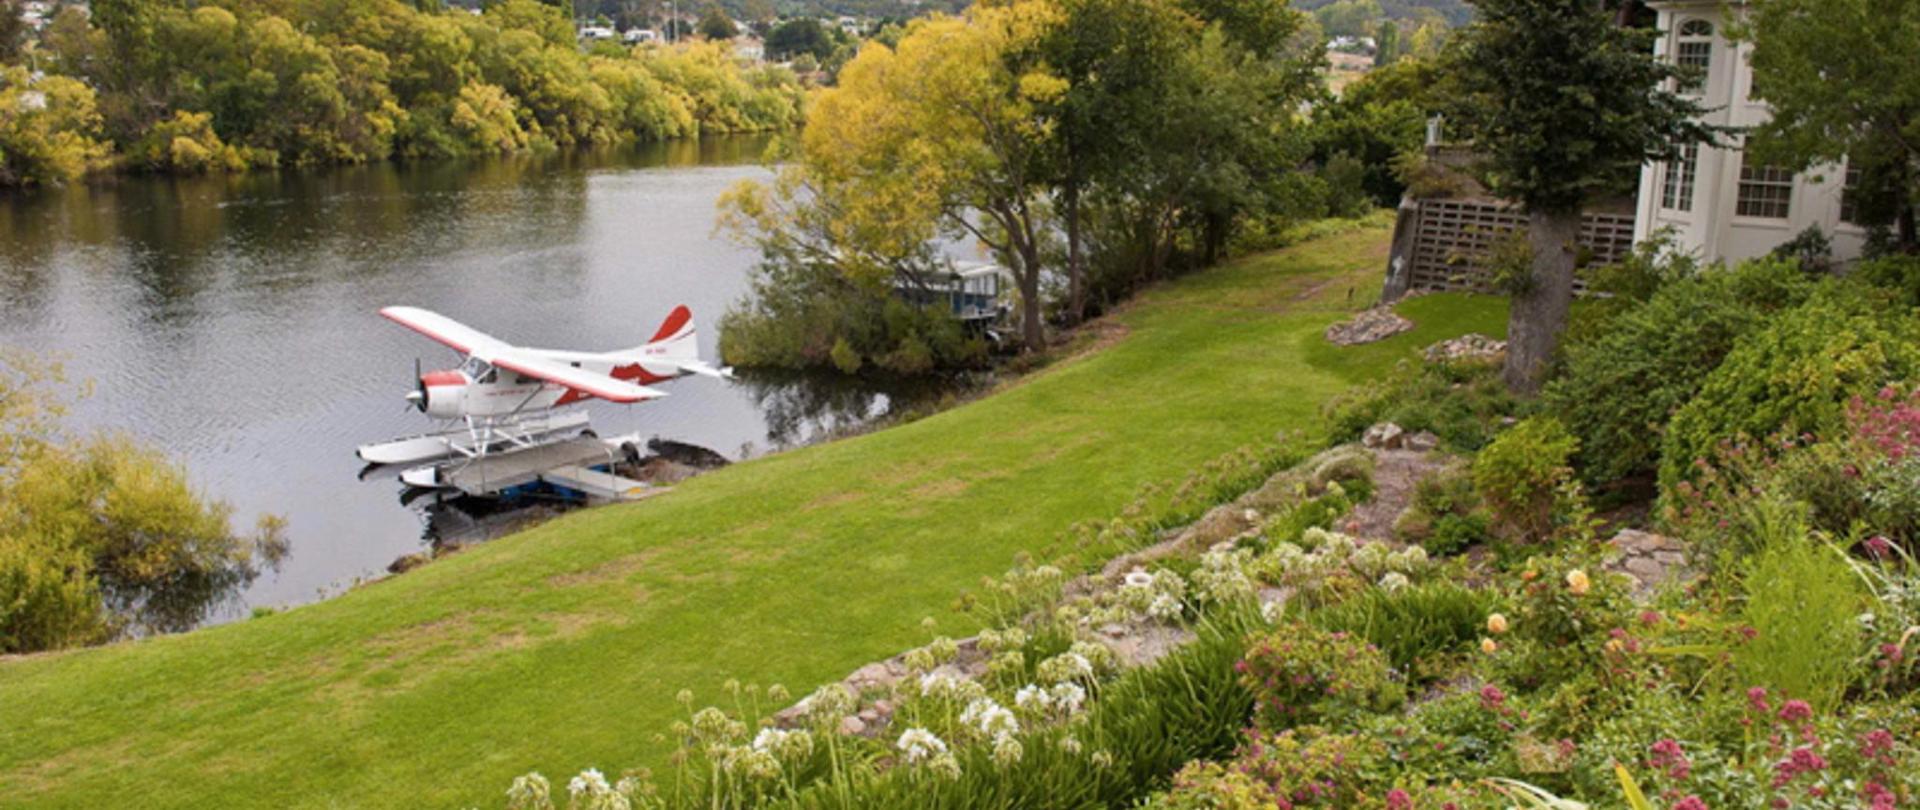 Woodbridge_seaplane-7637-1.jpg